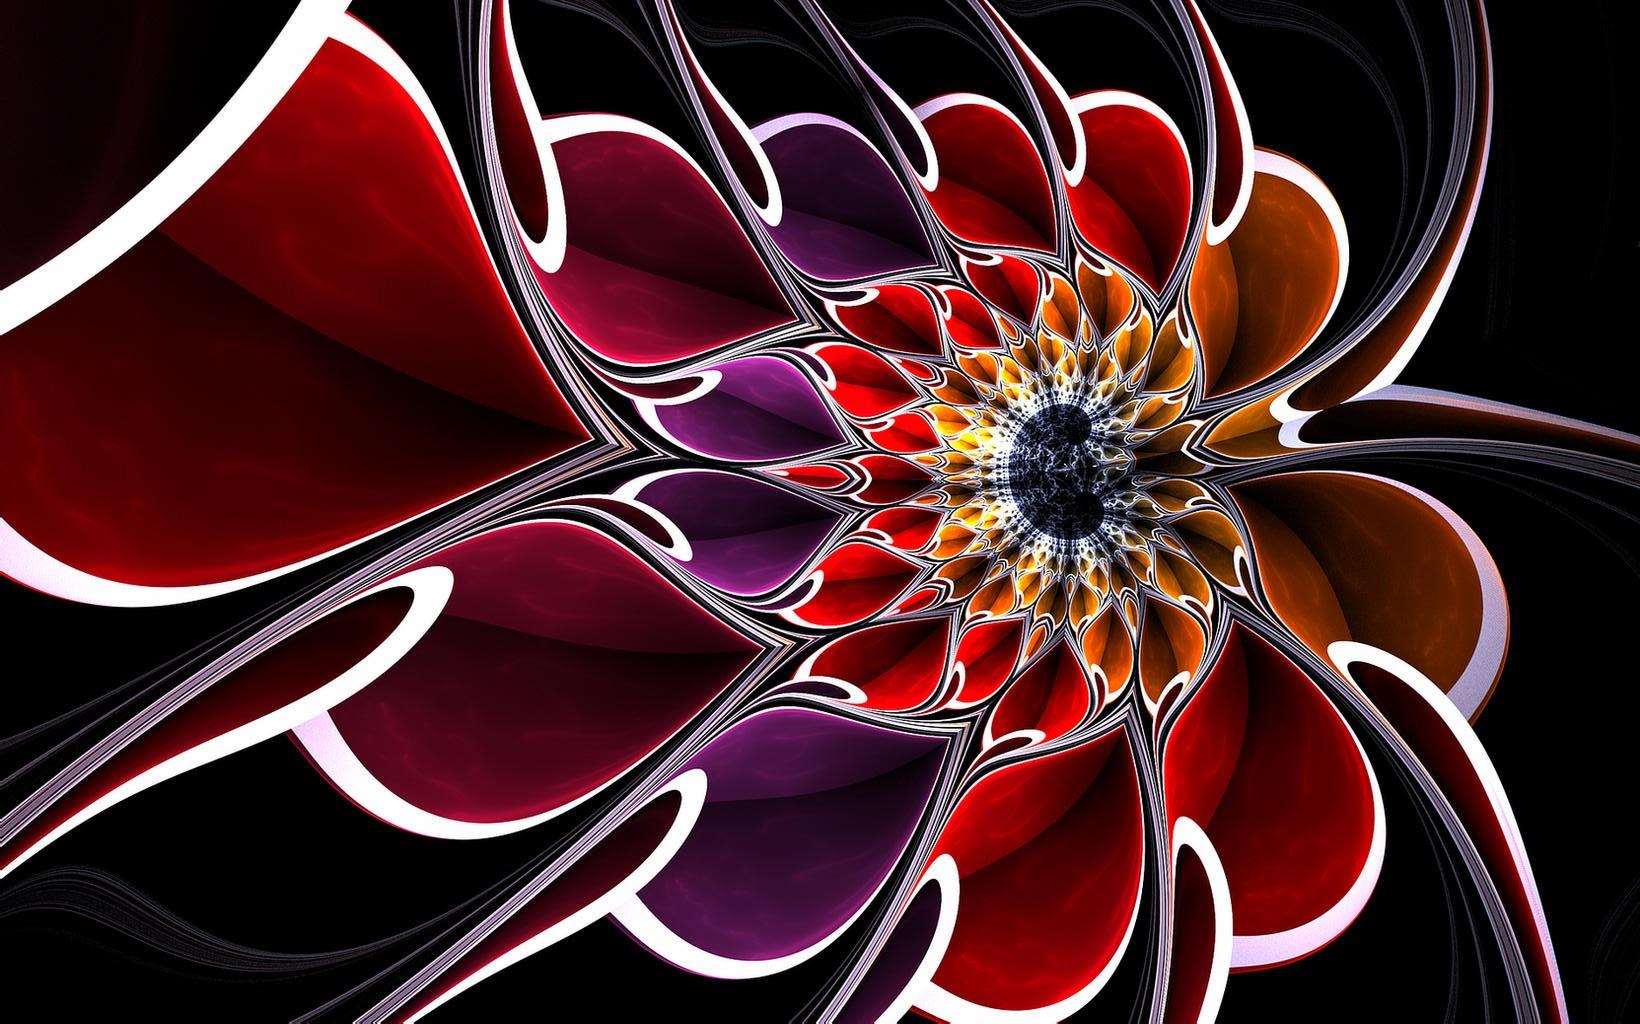 different-perspective-fractal-tantra-press-tantraesdevocion-inciensoshop